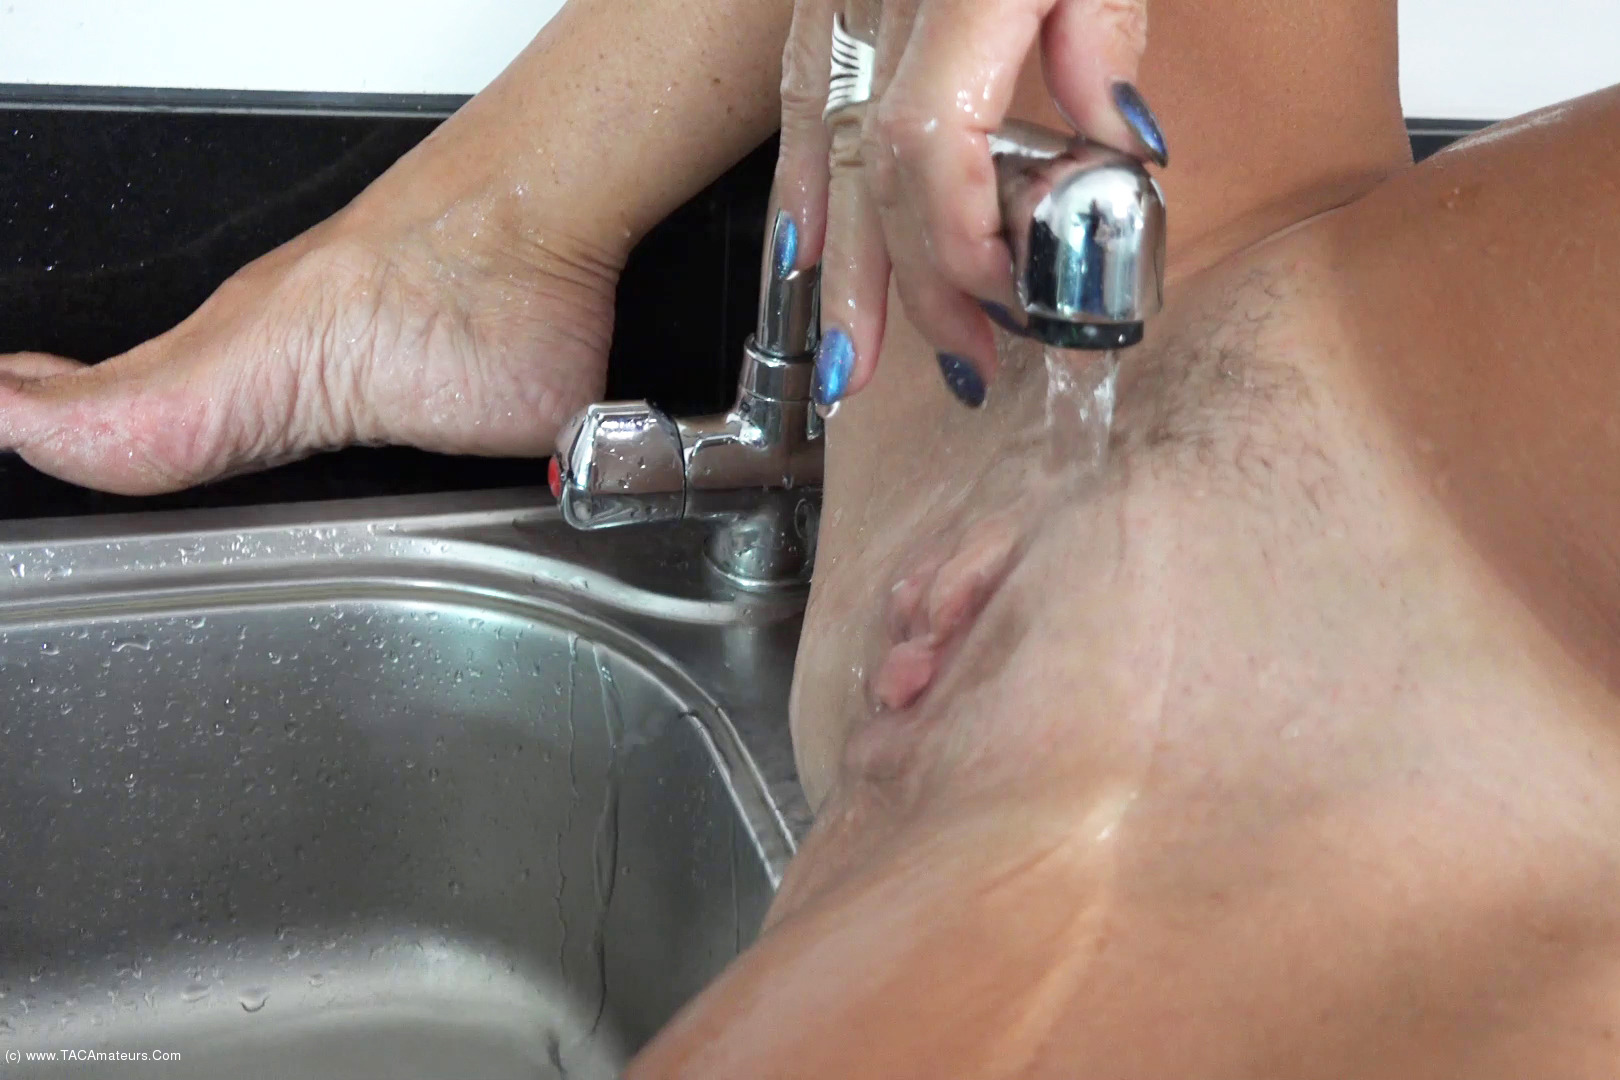 MollyMILF - Pissing In The Sink scene 3